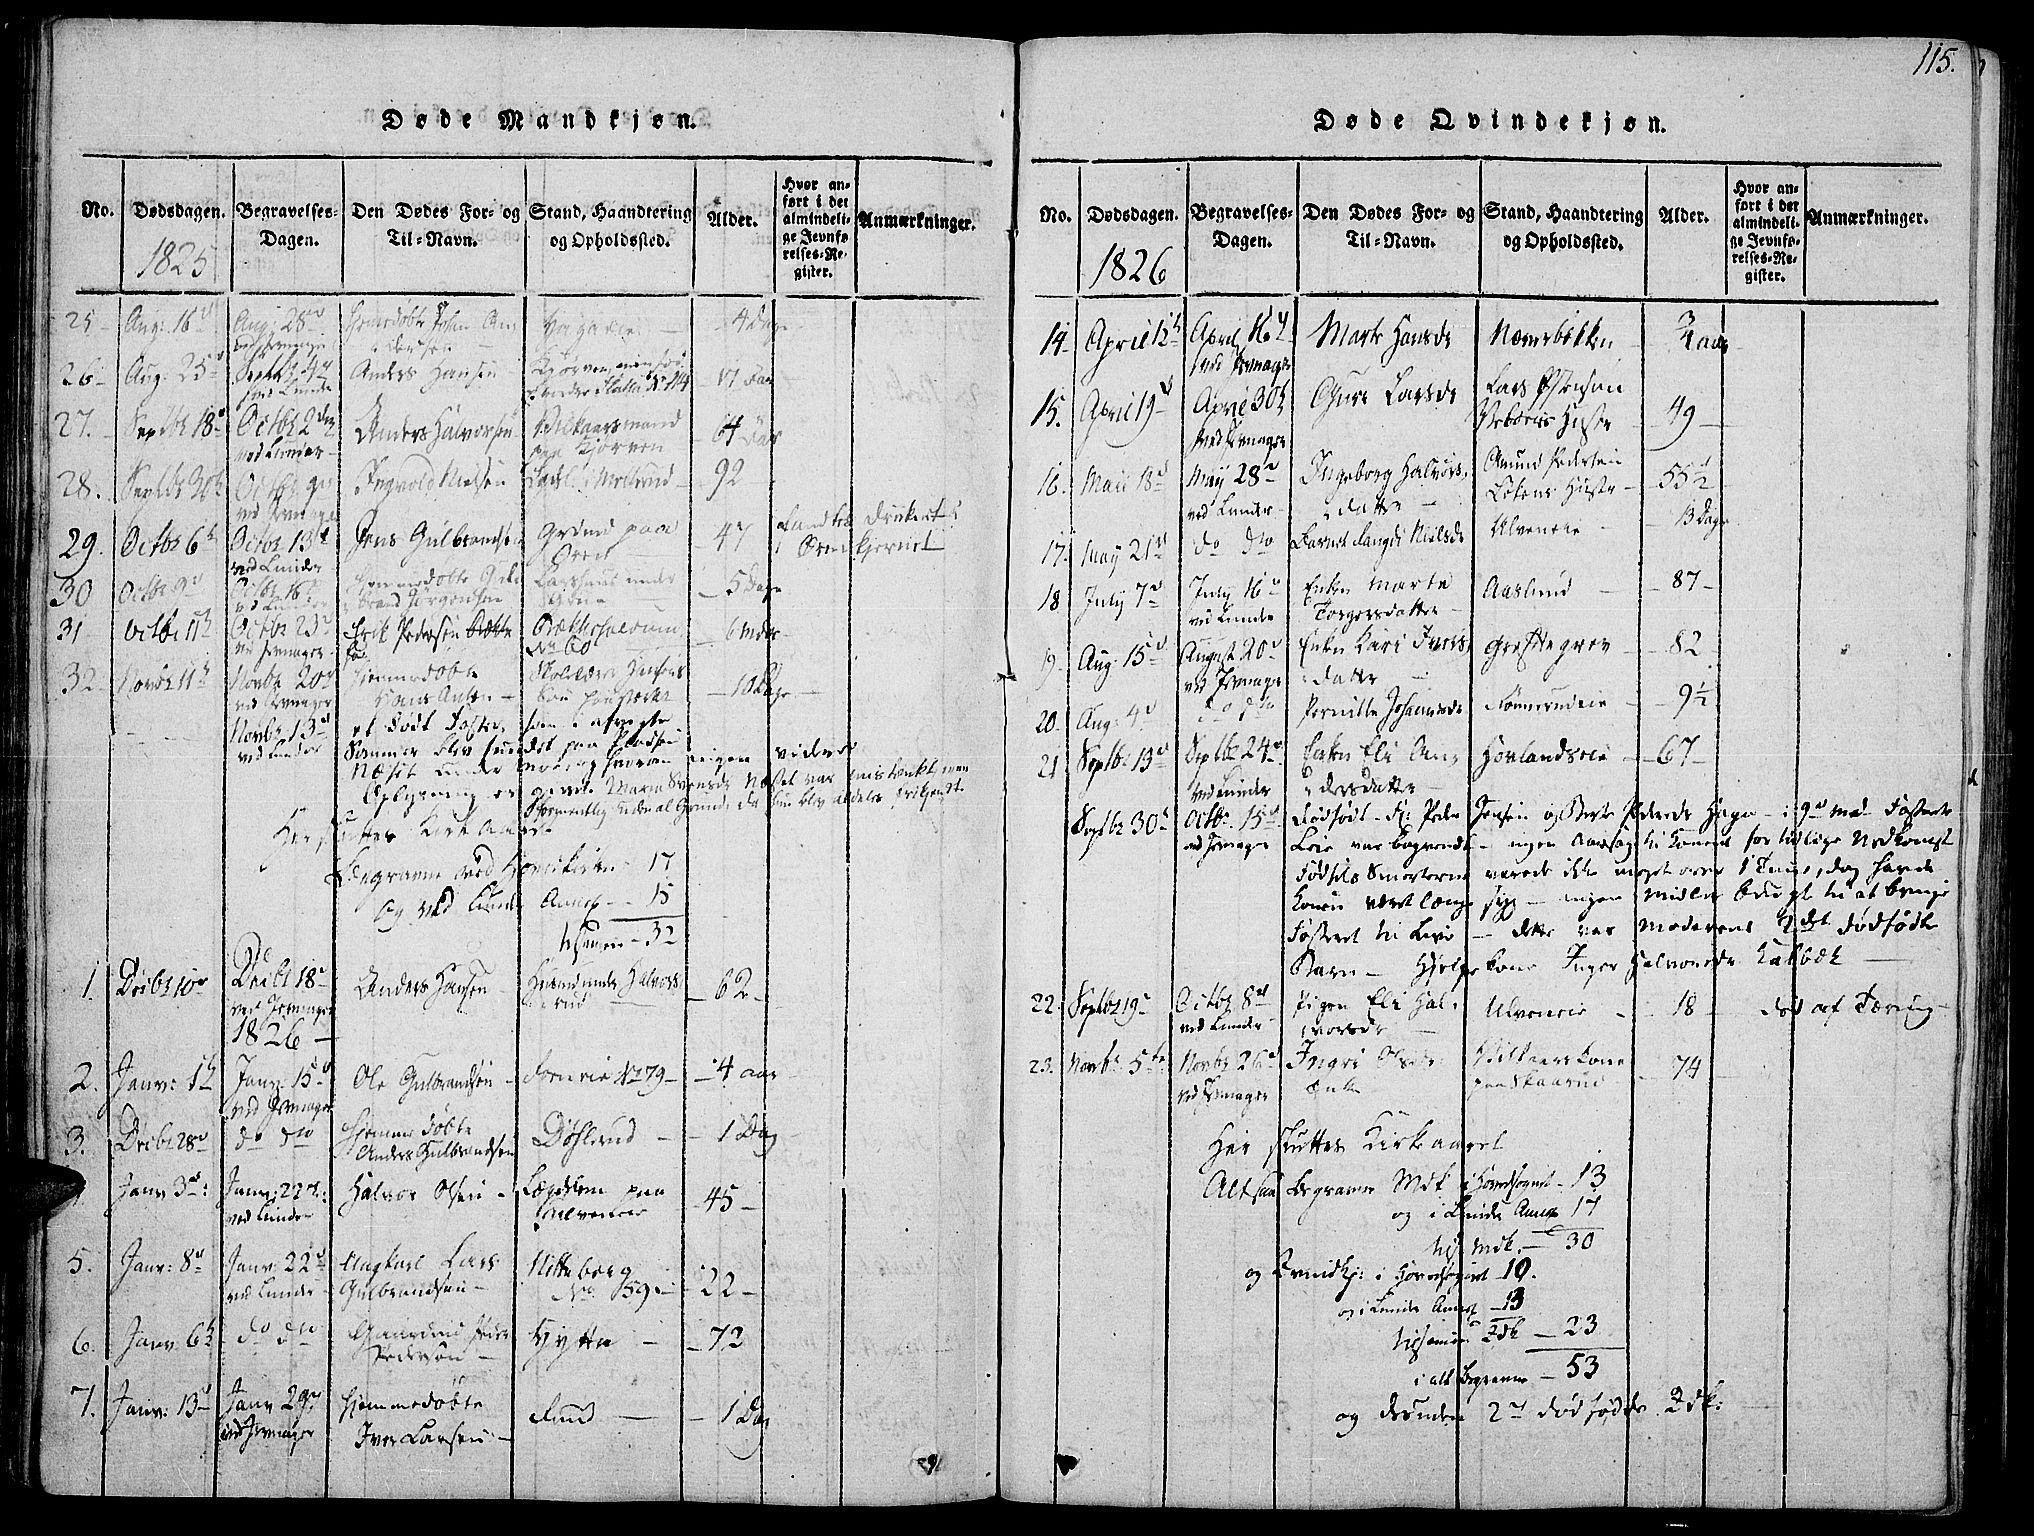 SAH, Jevnaker prestekontor, Ministerialbok nr. 5, 1815-1837, s. 115